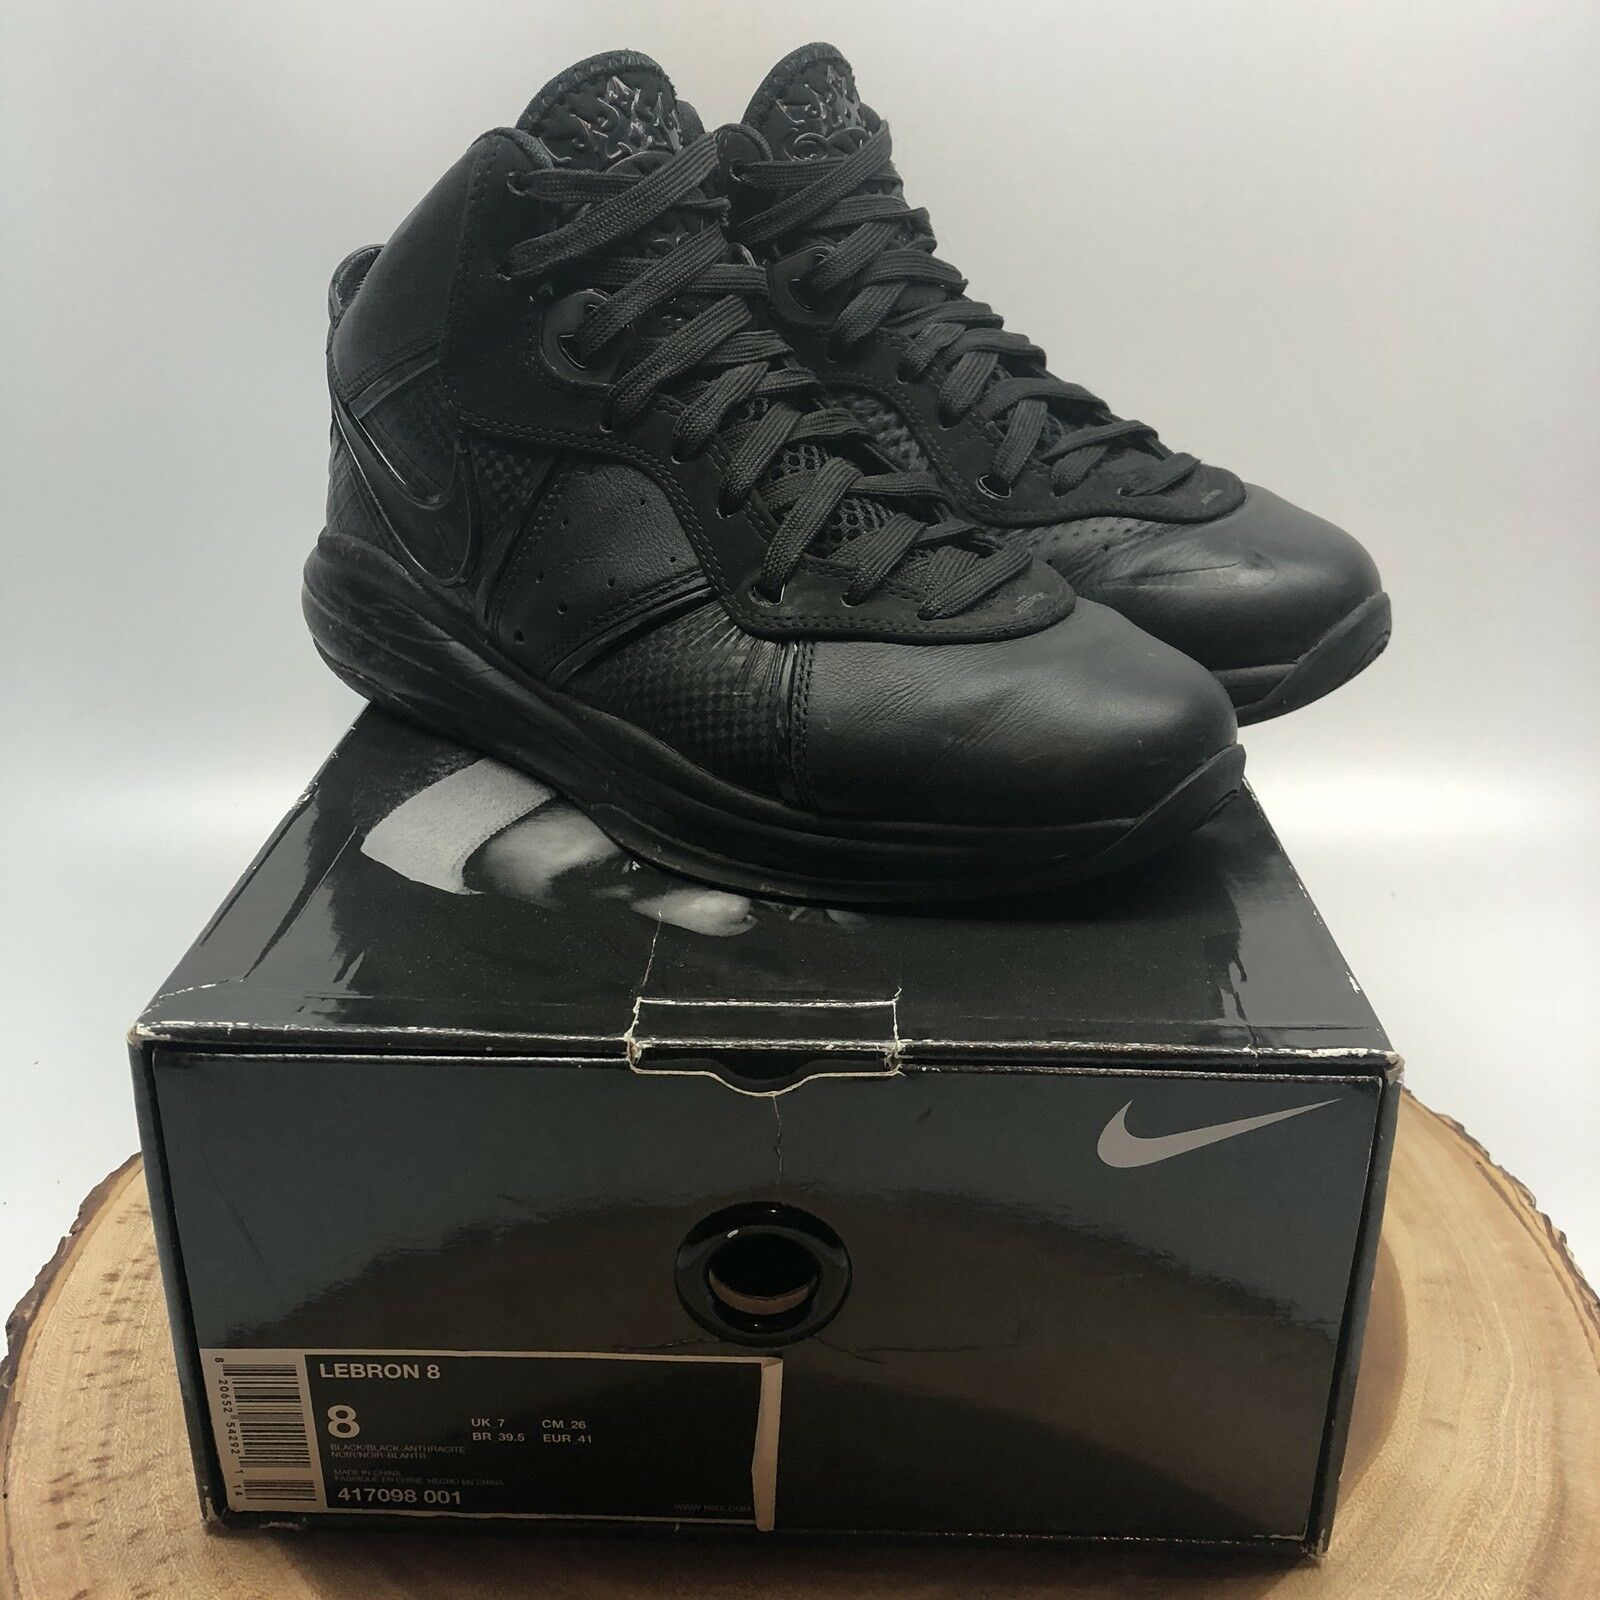 Zapatillas de baloncesto nike LeBron 8 apagón negro 420188 001 de Jordan Penny Foamposite liquidación de 001 temporada 87b56b